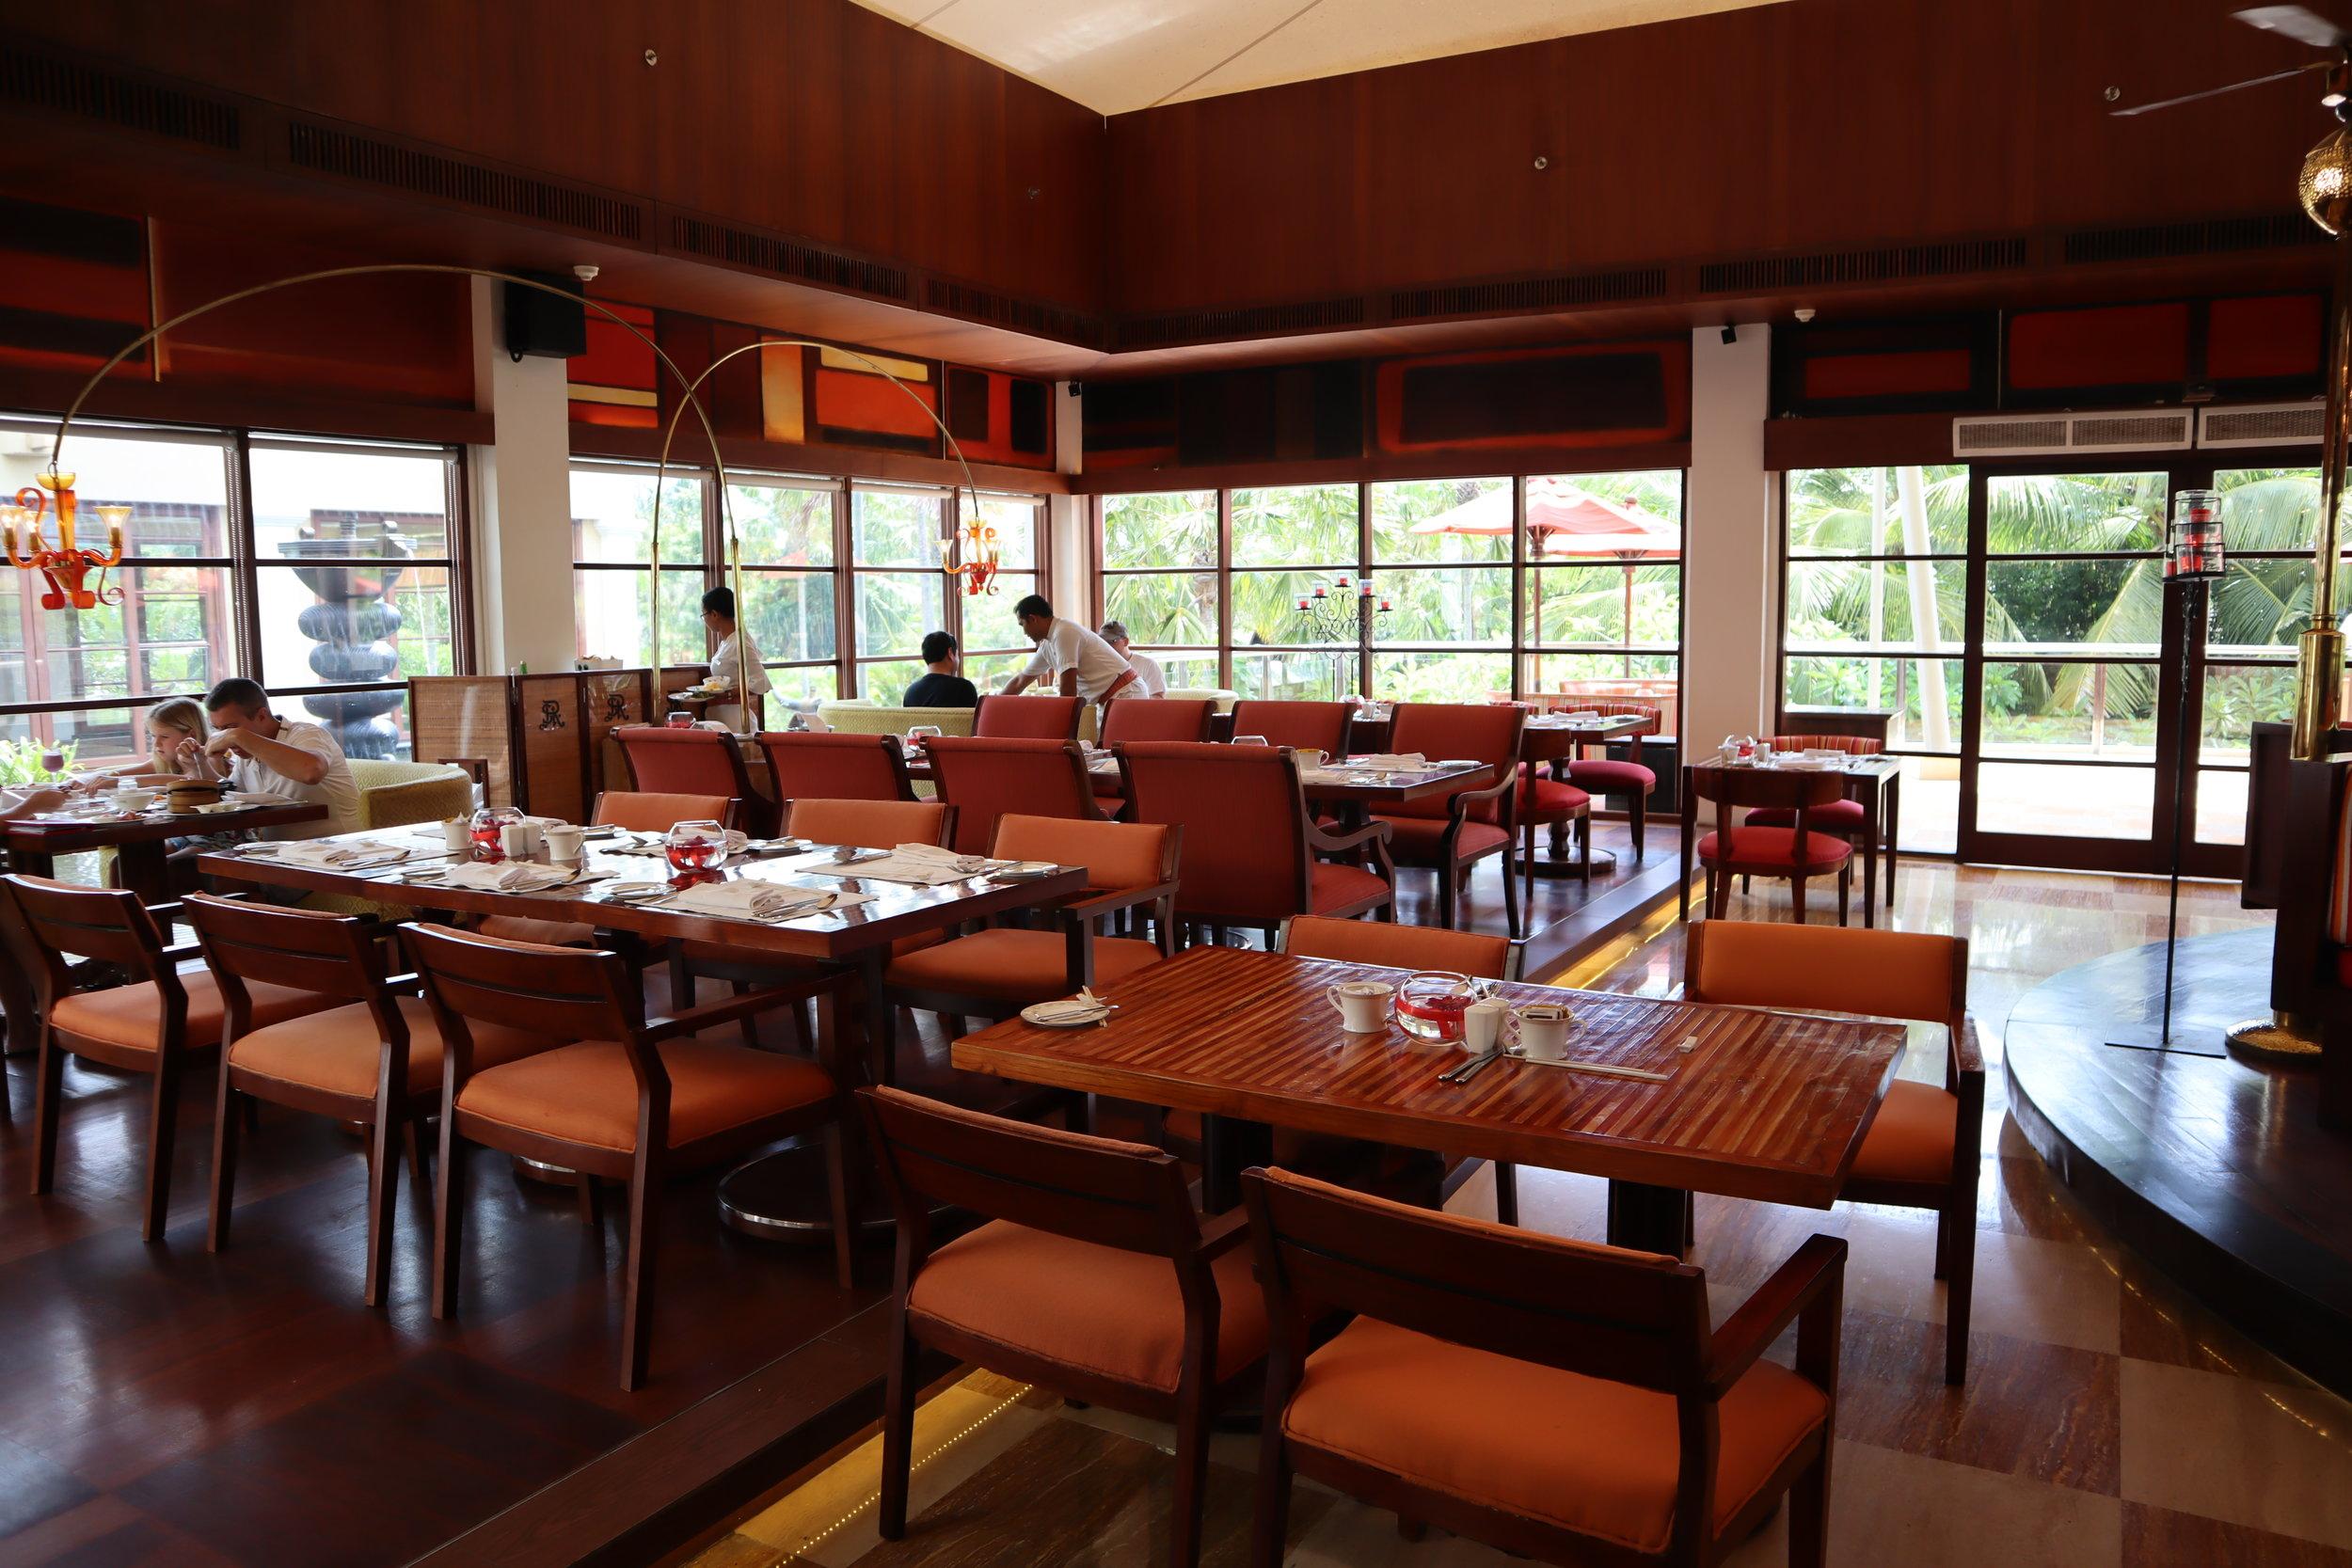 St. Regis Bali – Boneka restaurant